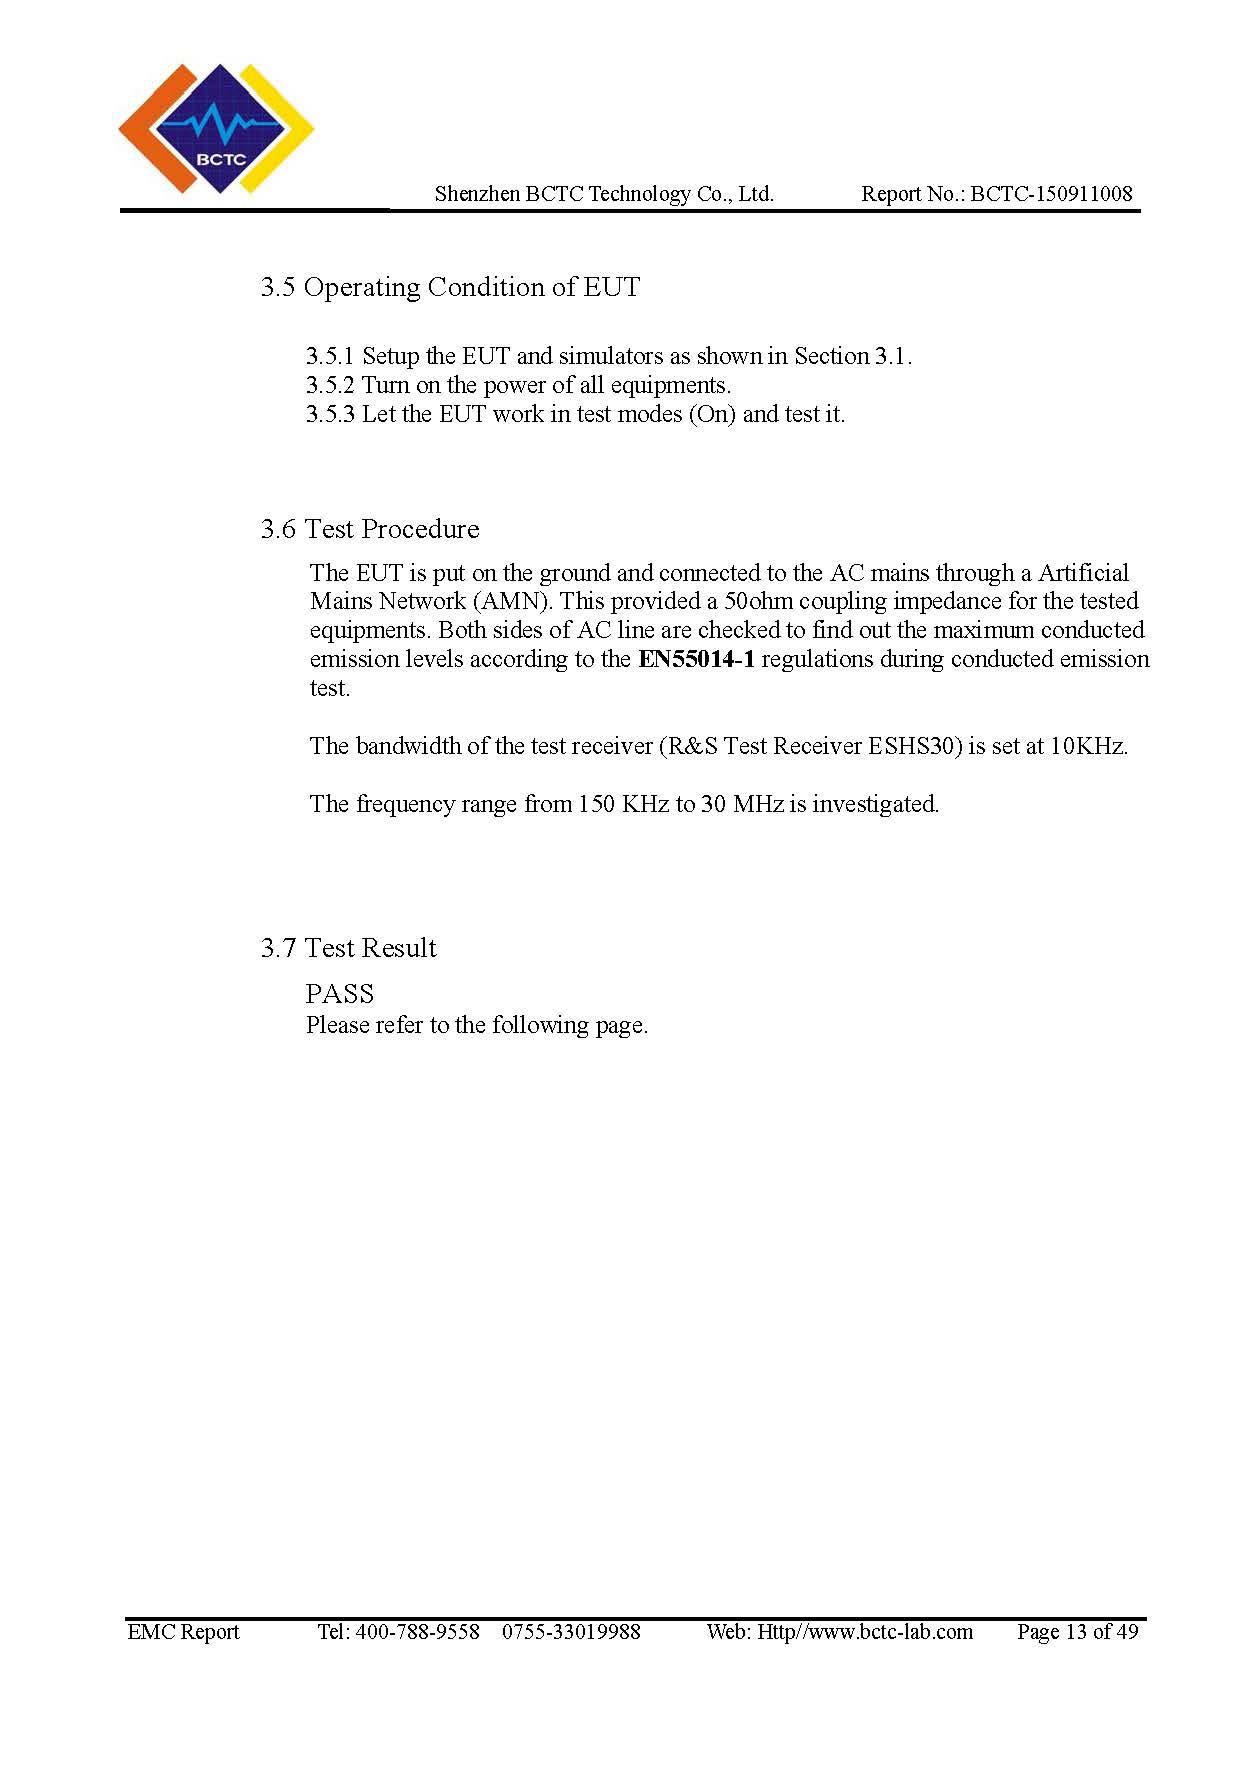 breathe-safe-ce-report-page-13.jpg